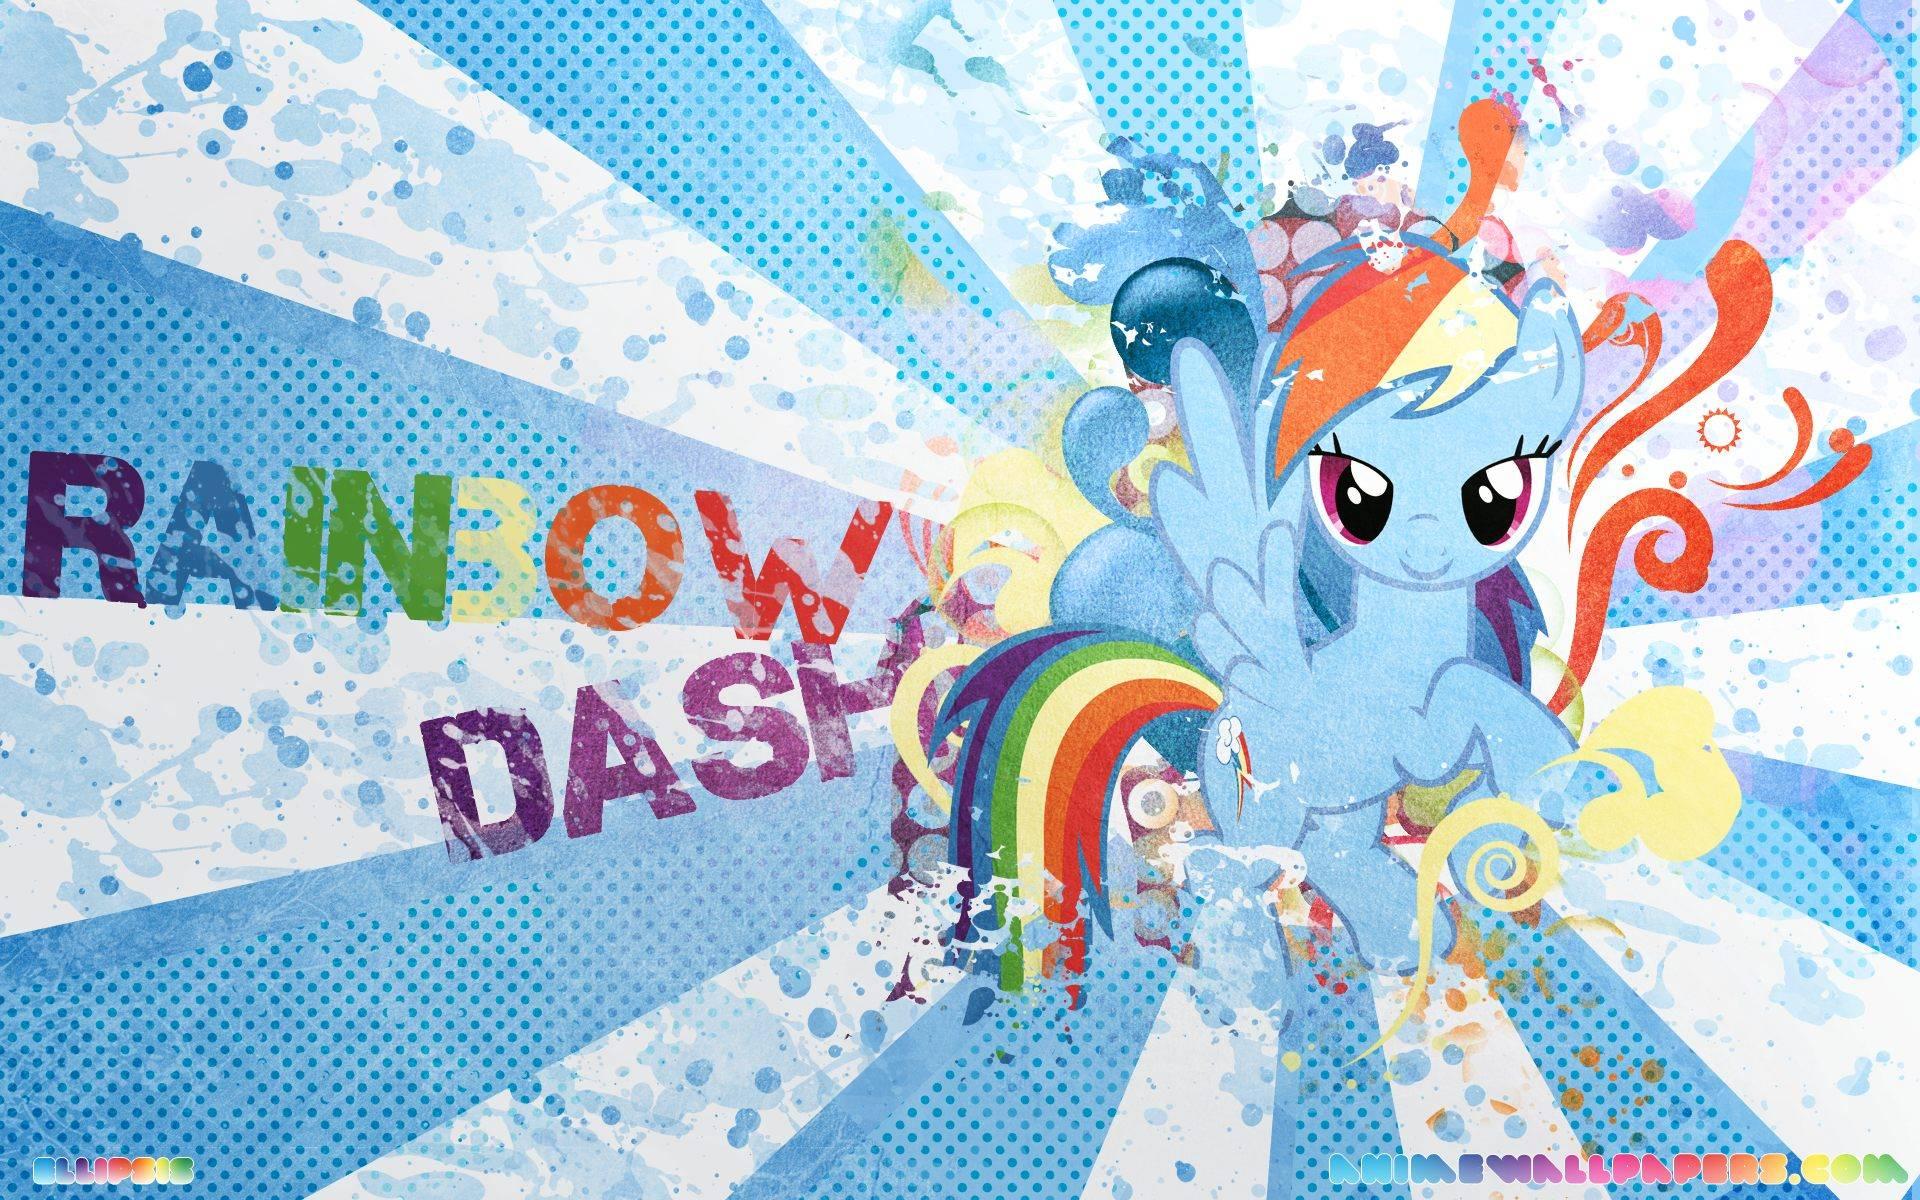 rainbow dash sphere background - photo #41